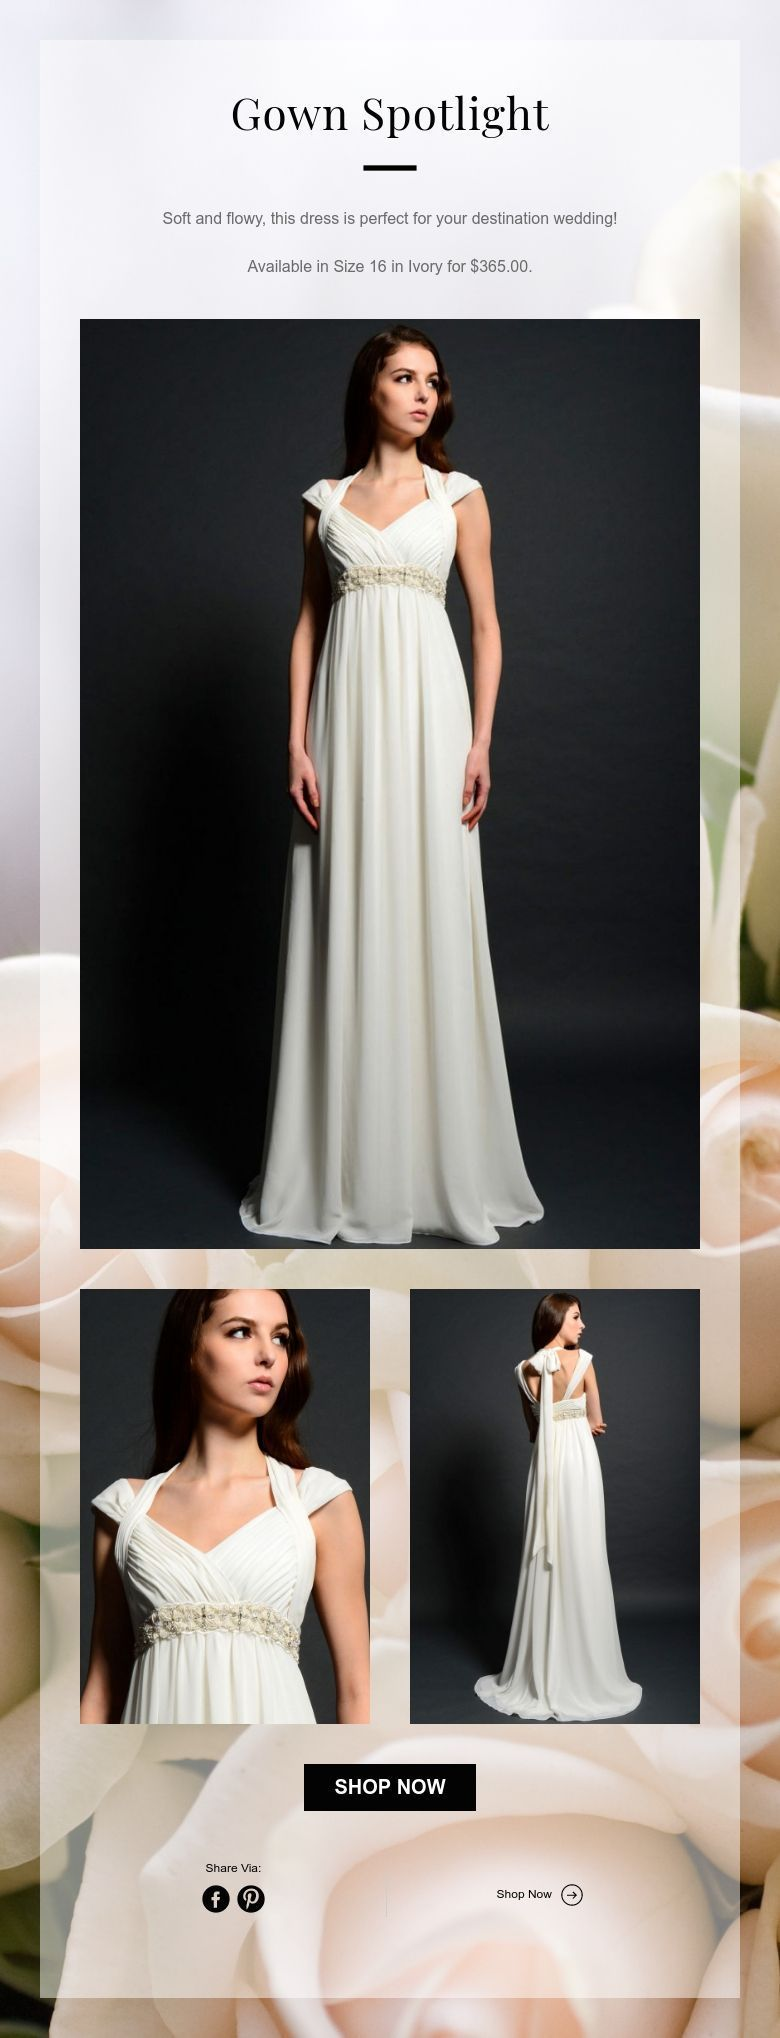 Wedding dress under 500  Grecian style wedding dress  New Never Worn or Altered  wedding